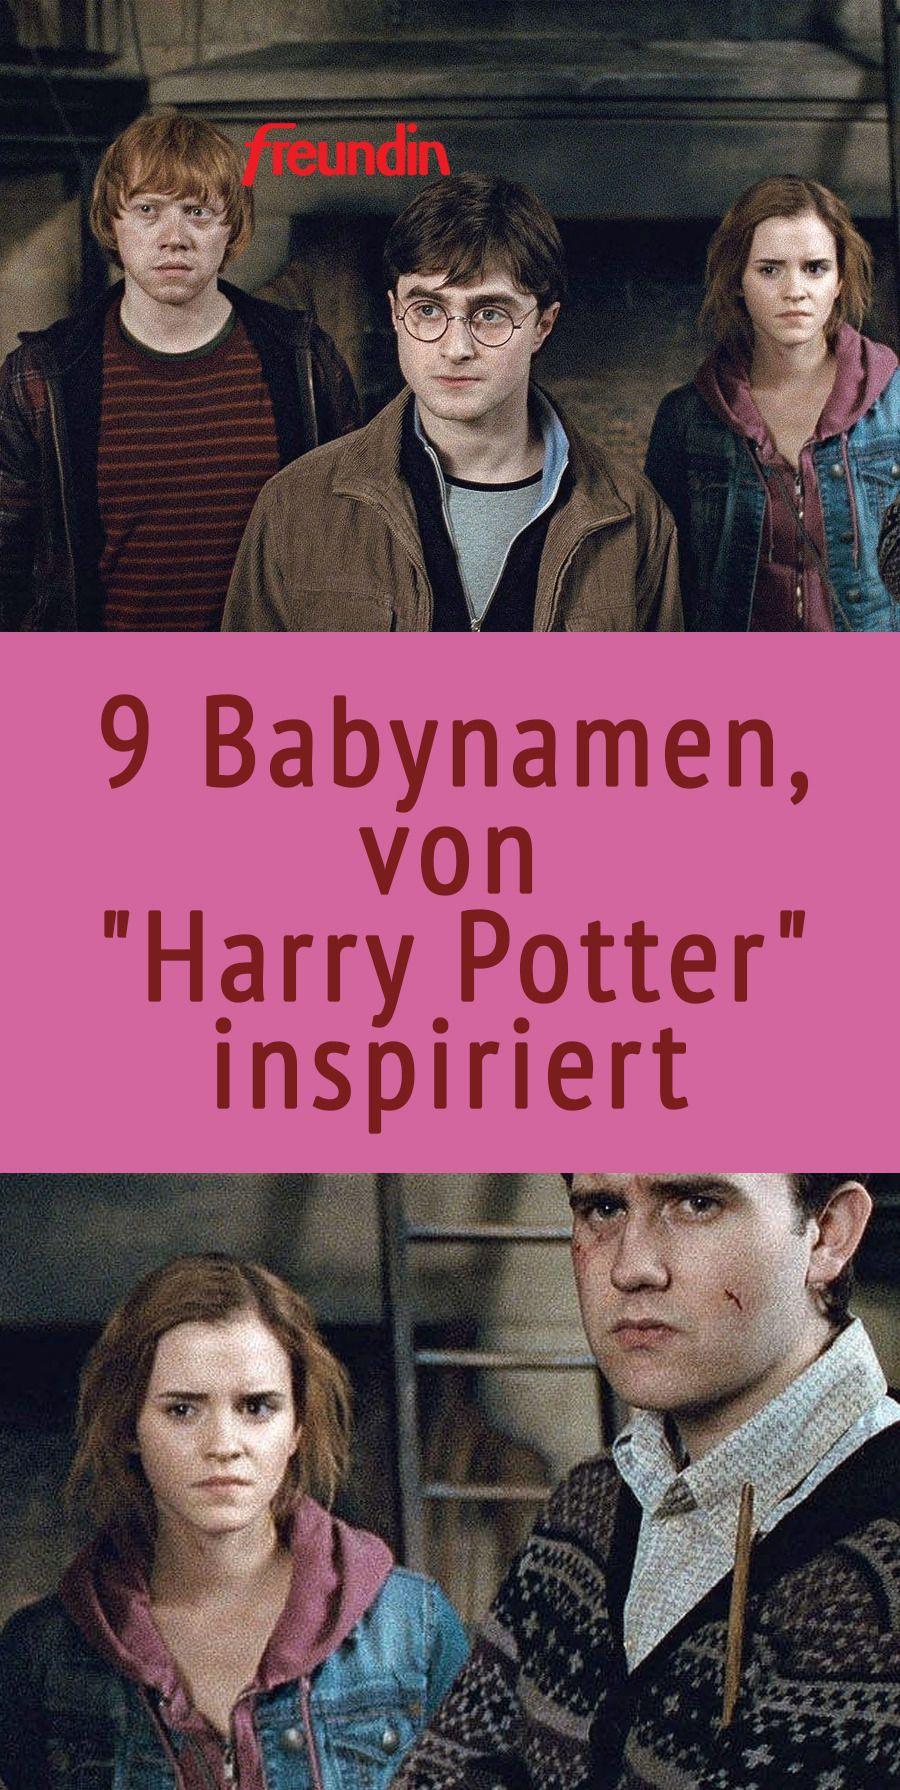 9 Zauberhafte Babynamen Von Harry Potter Inspiriert Freundin De Babynamen Hipster Babynamen Beliebte Vornamen